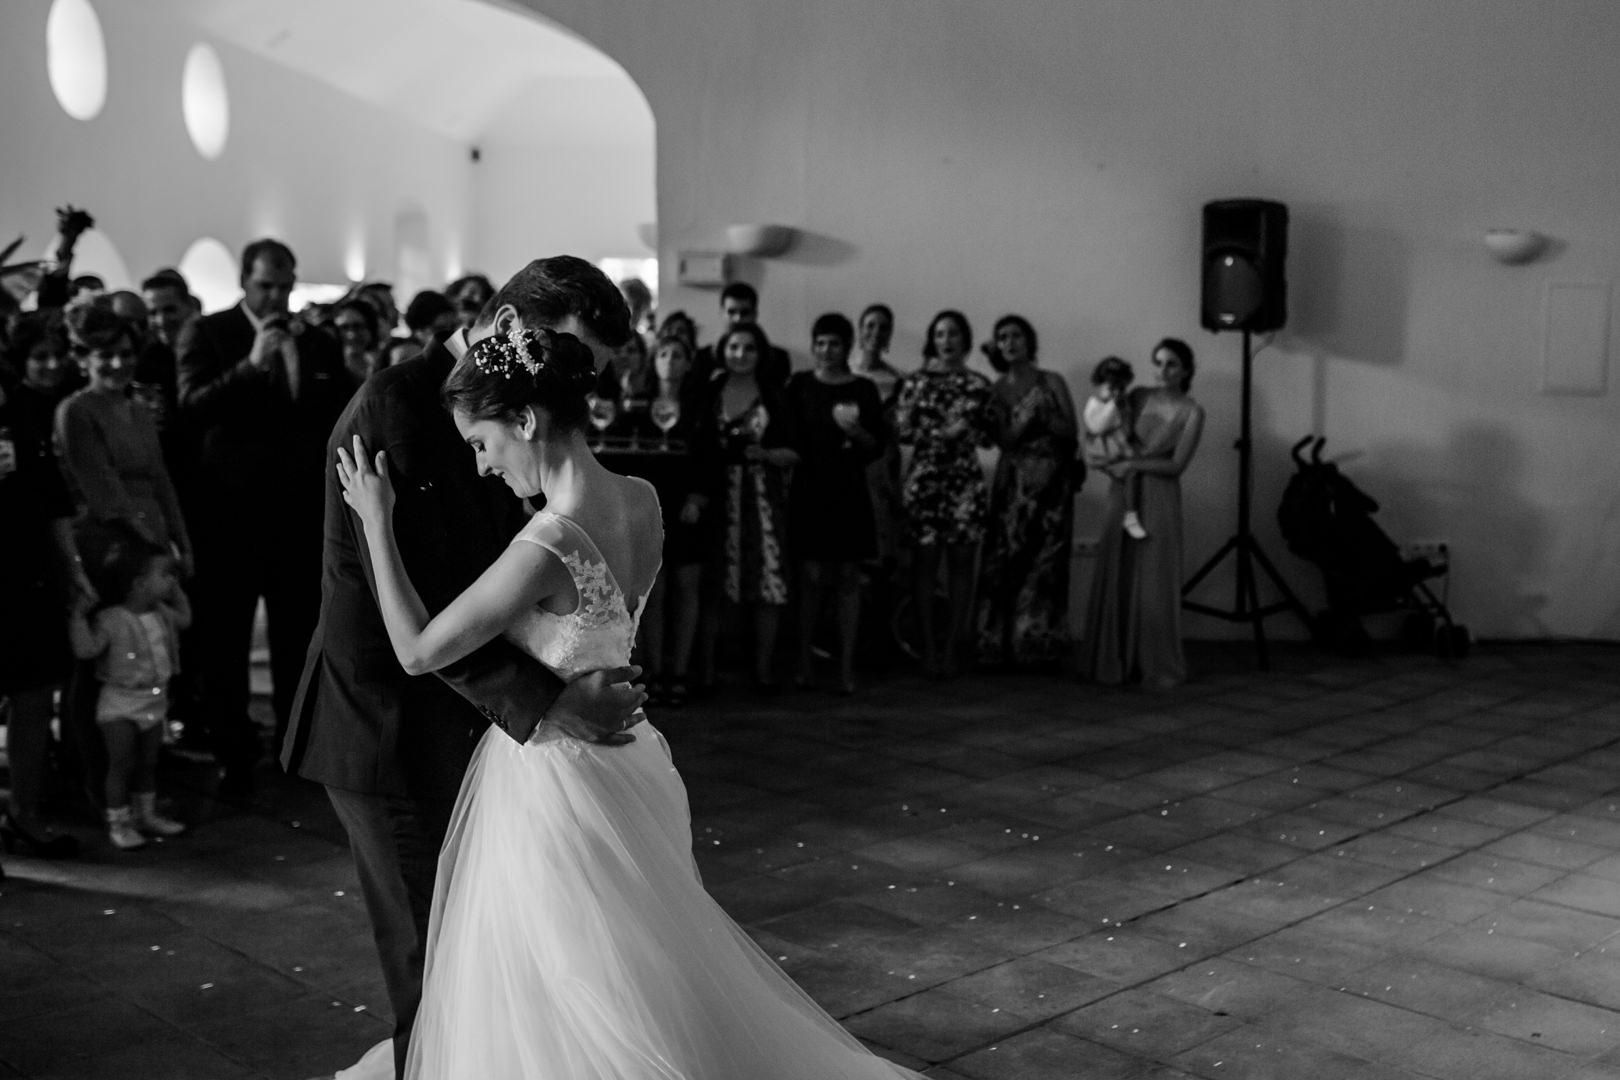 Boda-Hacienda-LOrigen-Pepe-Maria-engagement-Rafael-Torres-fotografo-bodas-sevilla-madrid-barcelona-wedding-photographer--30.jpg